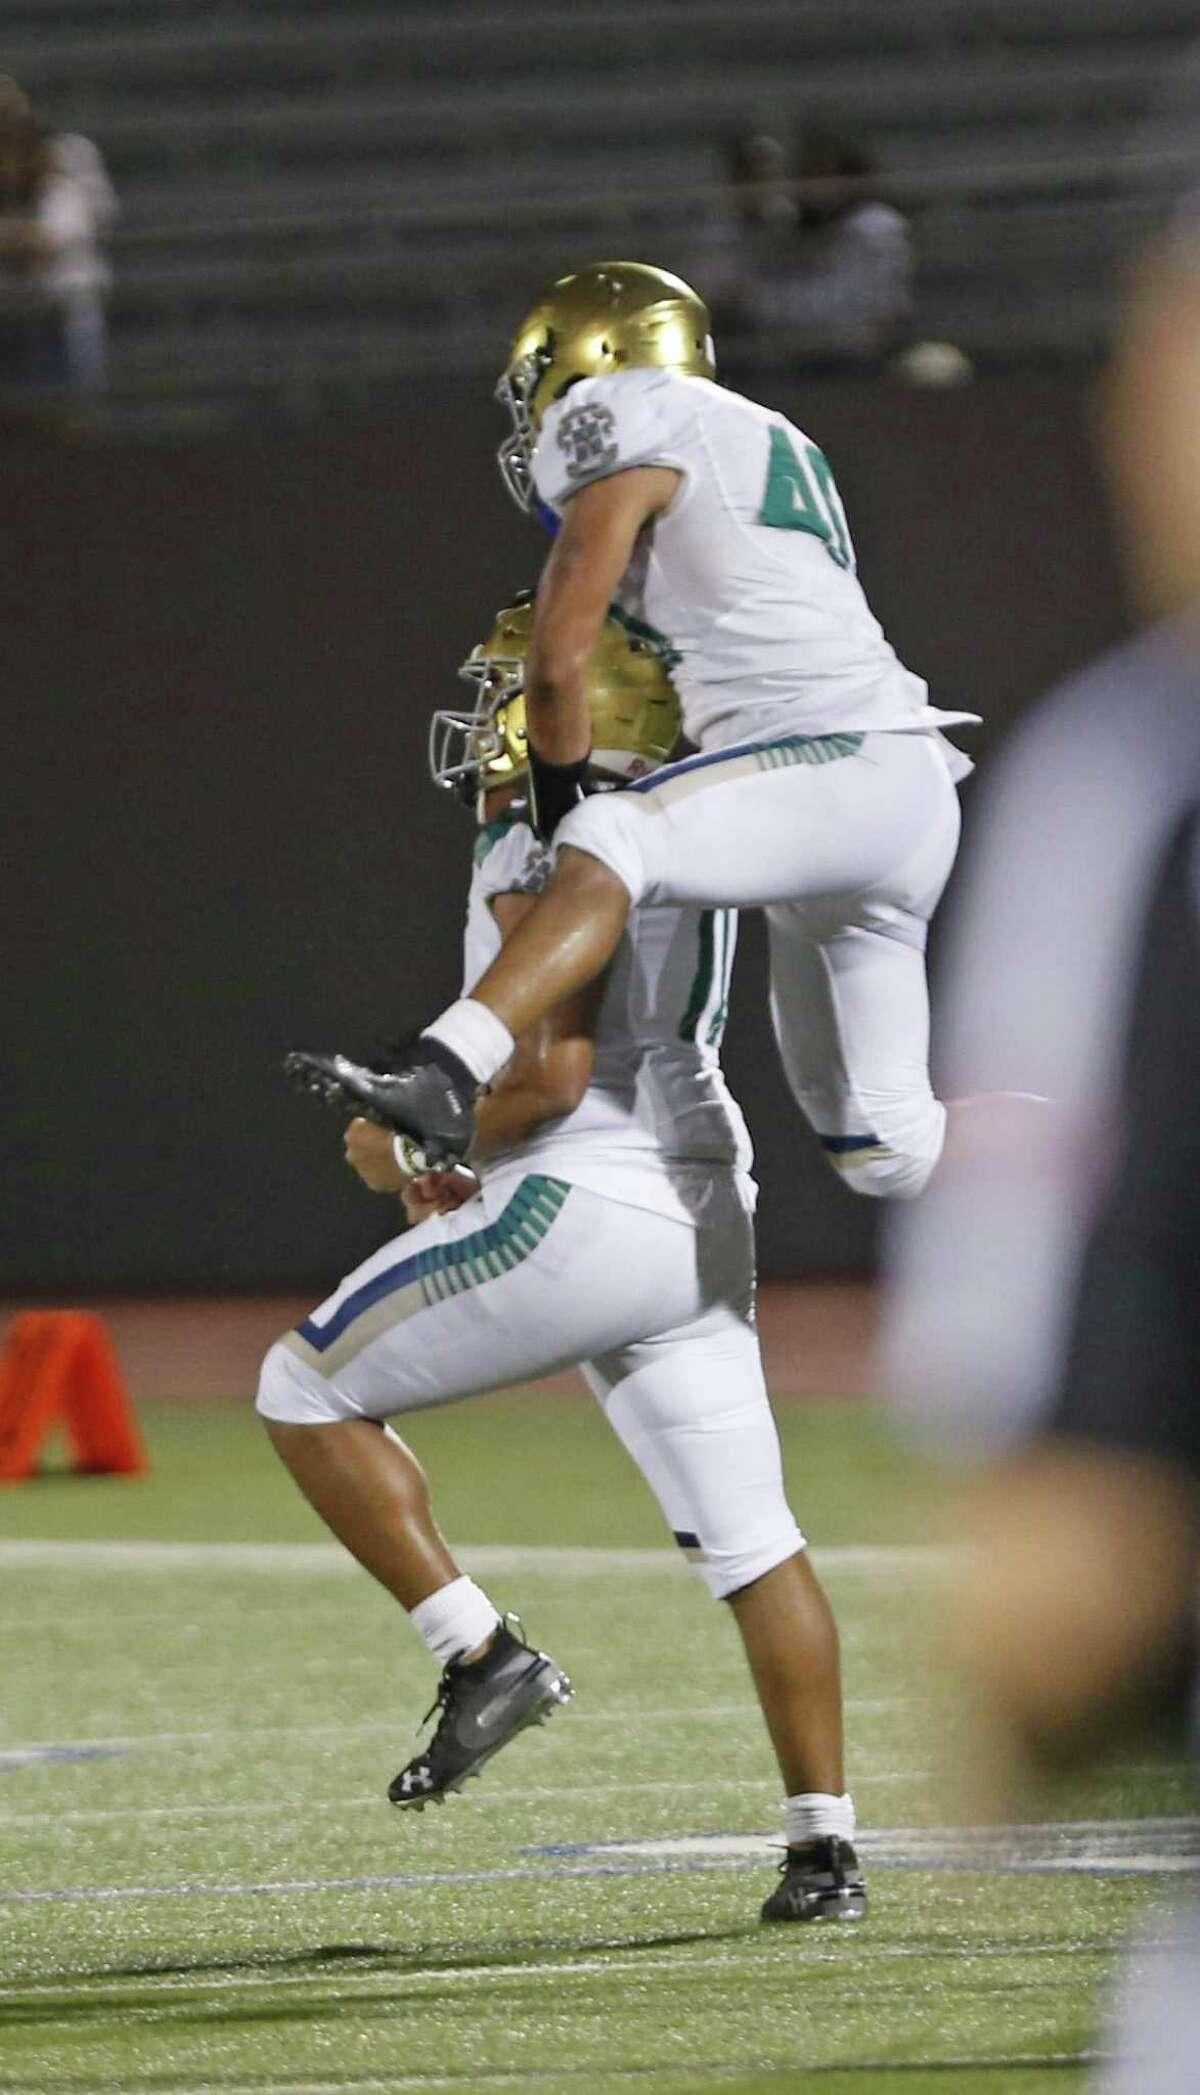 Holy Cross Alvardo Mason jumps on Michael Kalijah after the sack to end the game. Central Catholic v Holy Cross at Alamo Stadium on Sat, September 8, 2018.